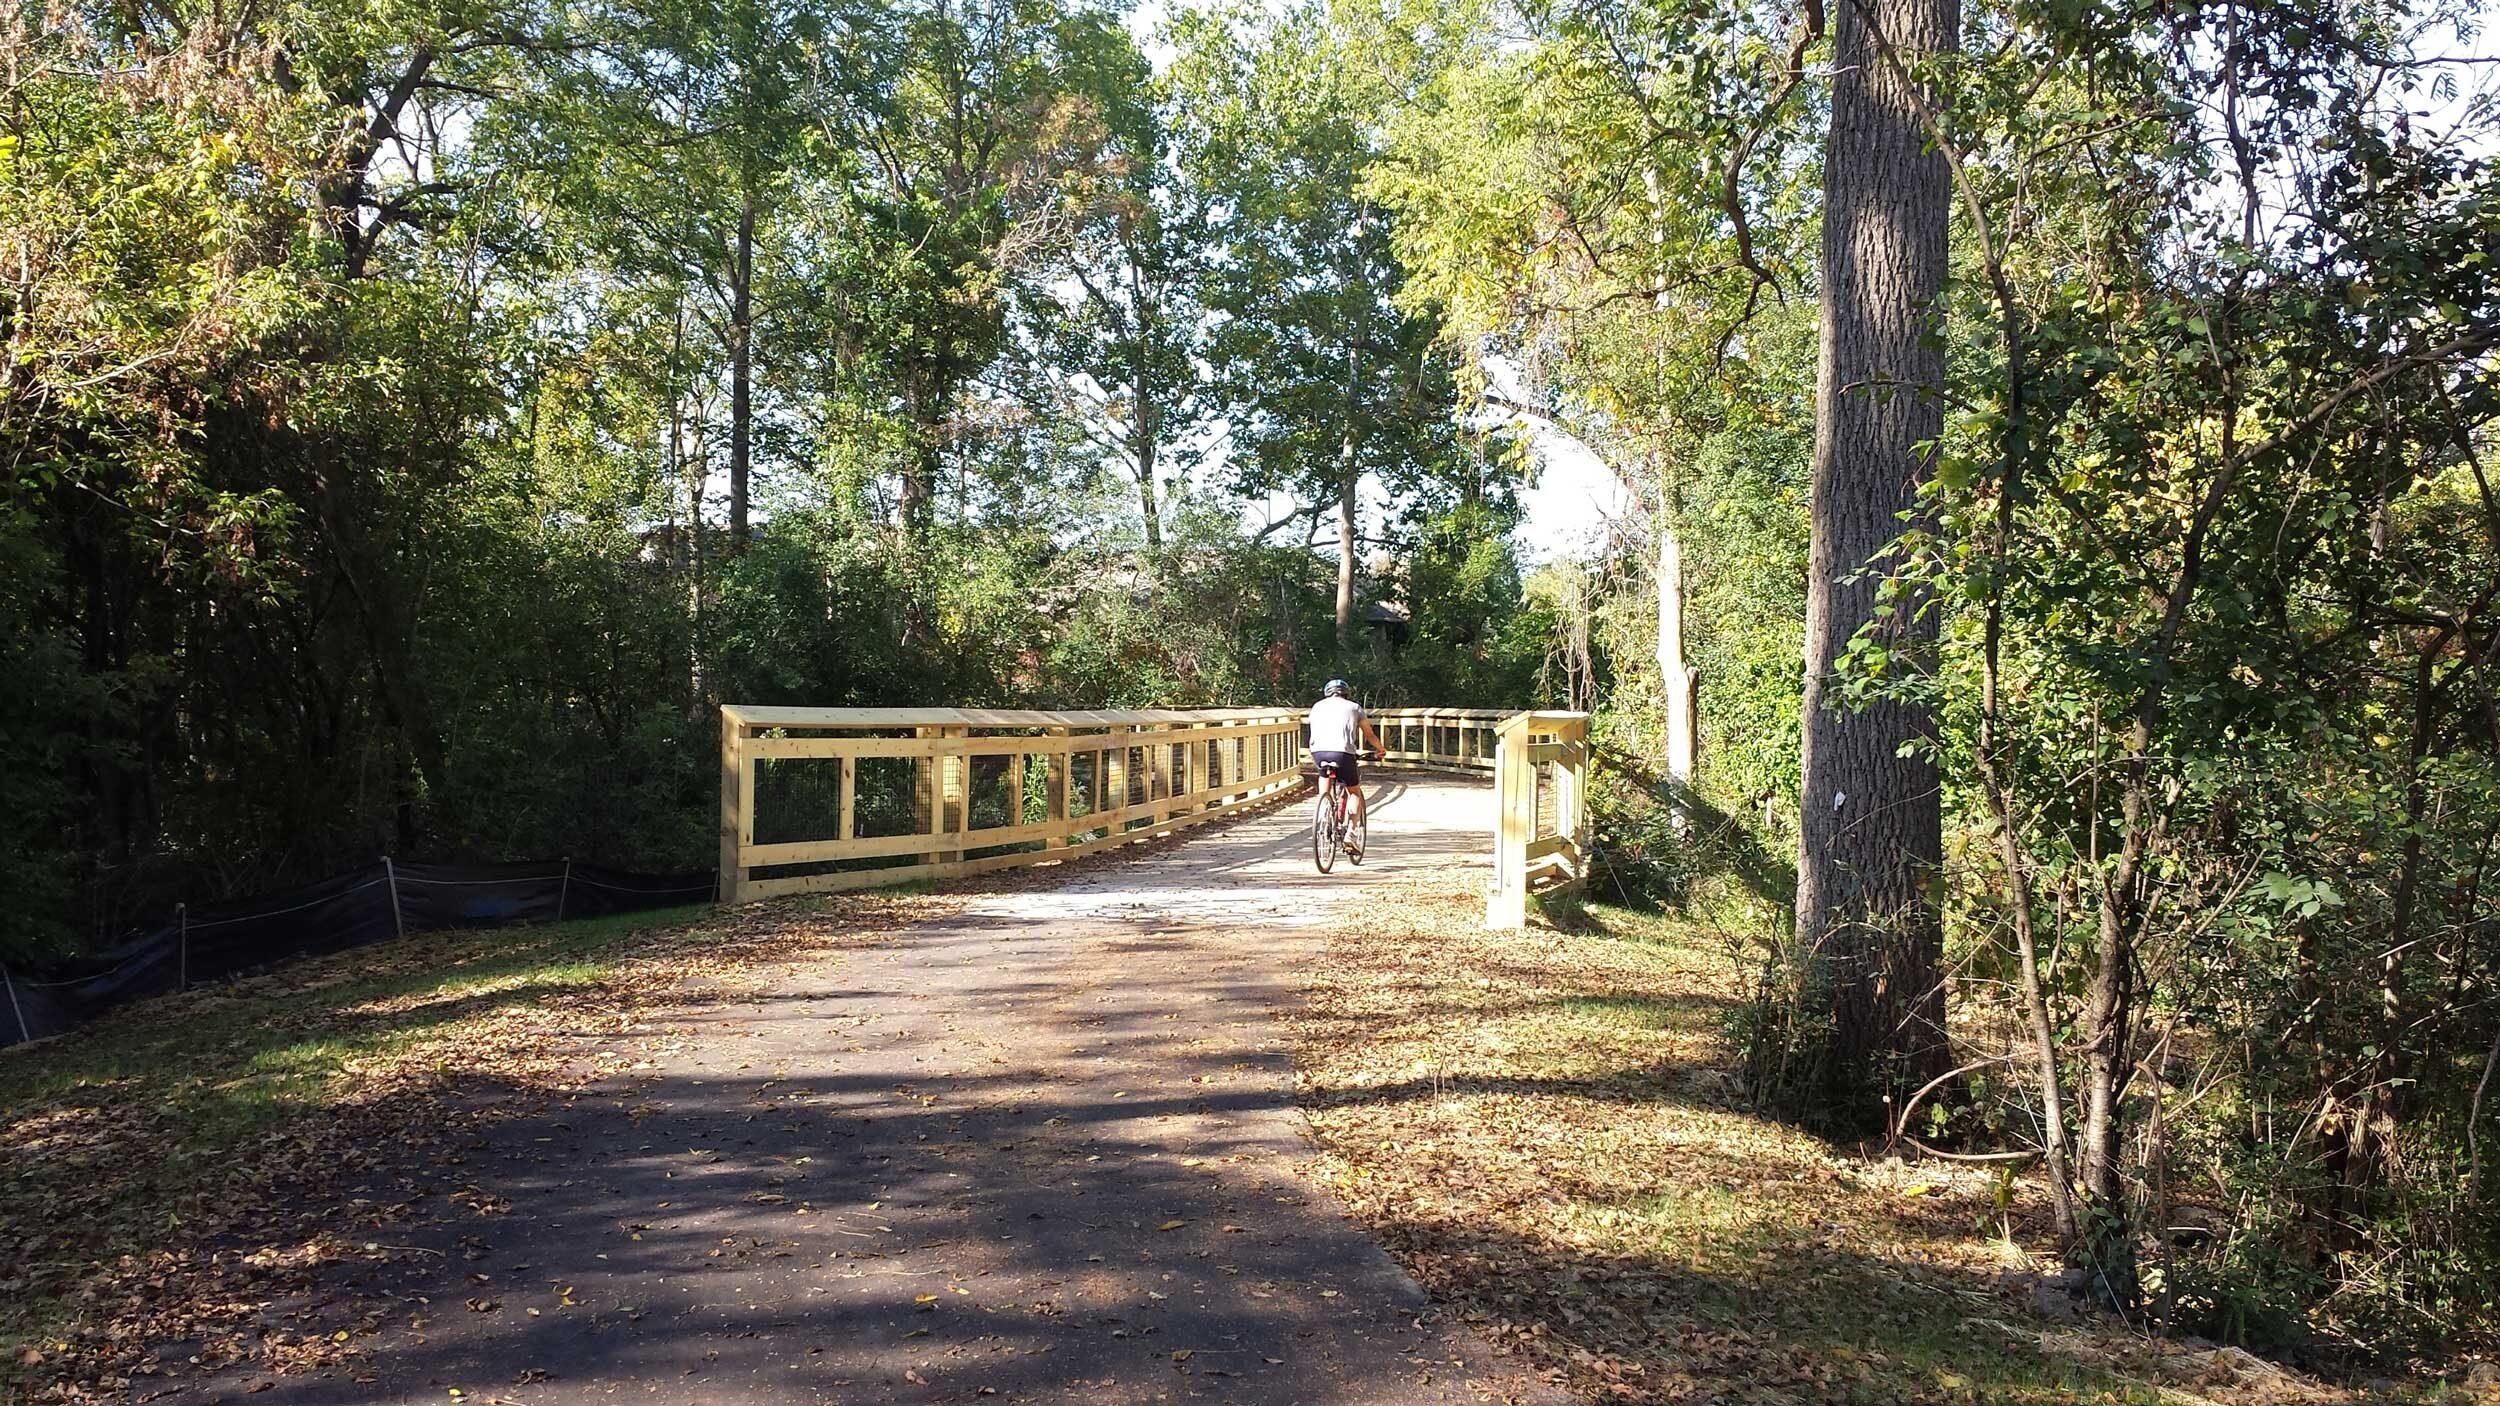 Trail opens linking u m botanical gardens to campus regional hiking biking routes michigan impact for University of michigan botanical gardens